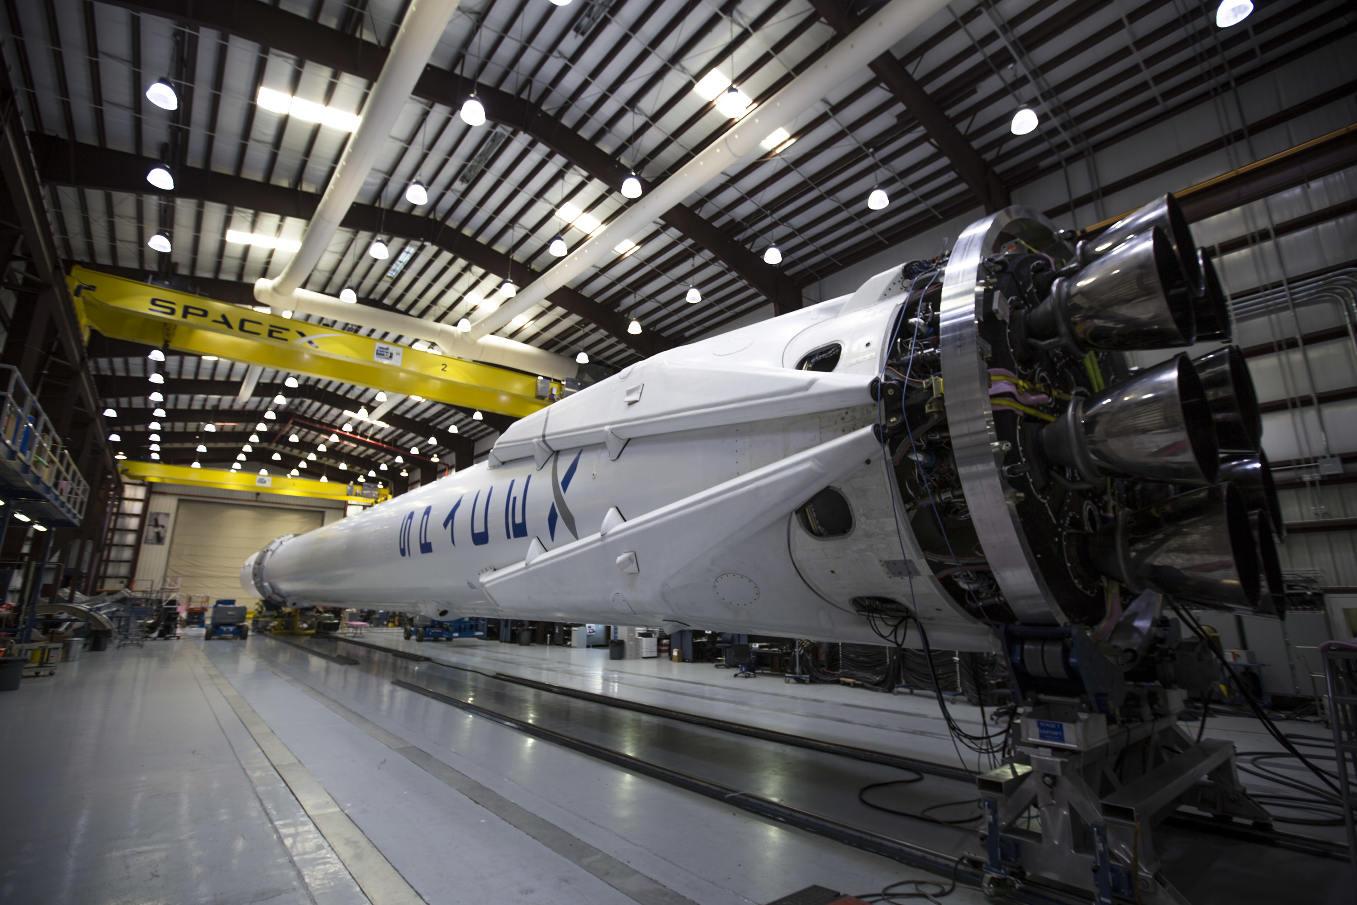 SpaceX set to resume flights